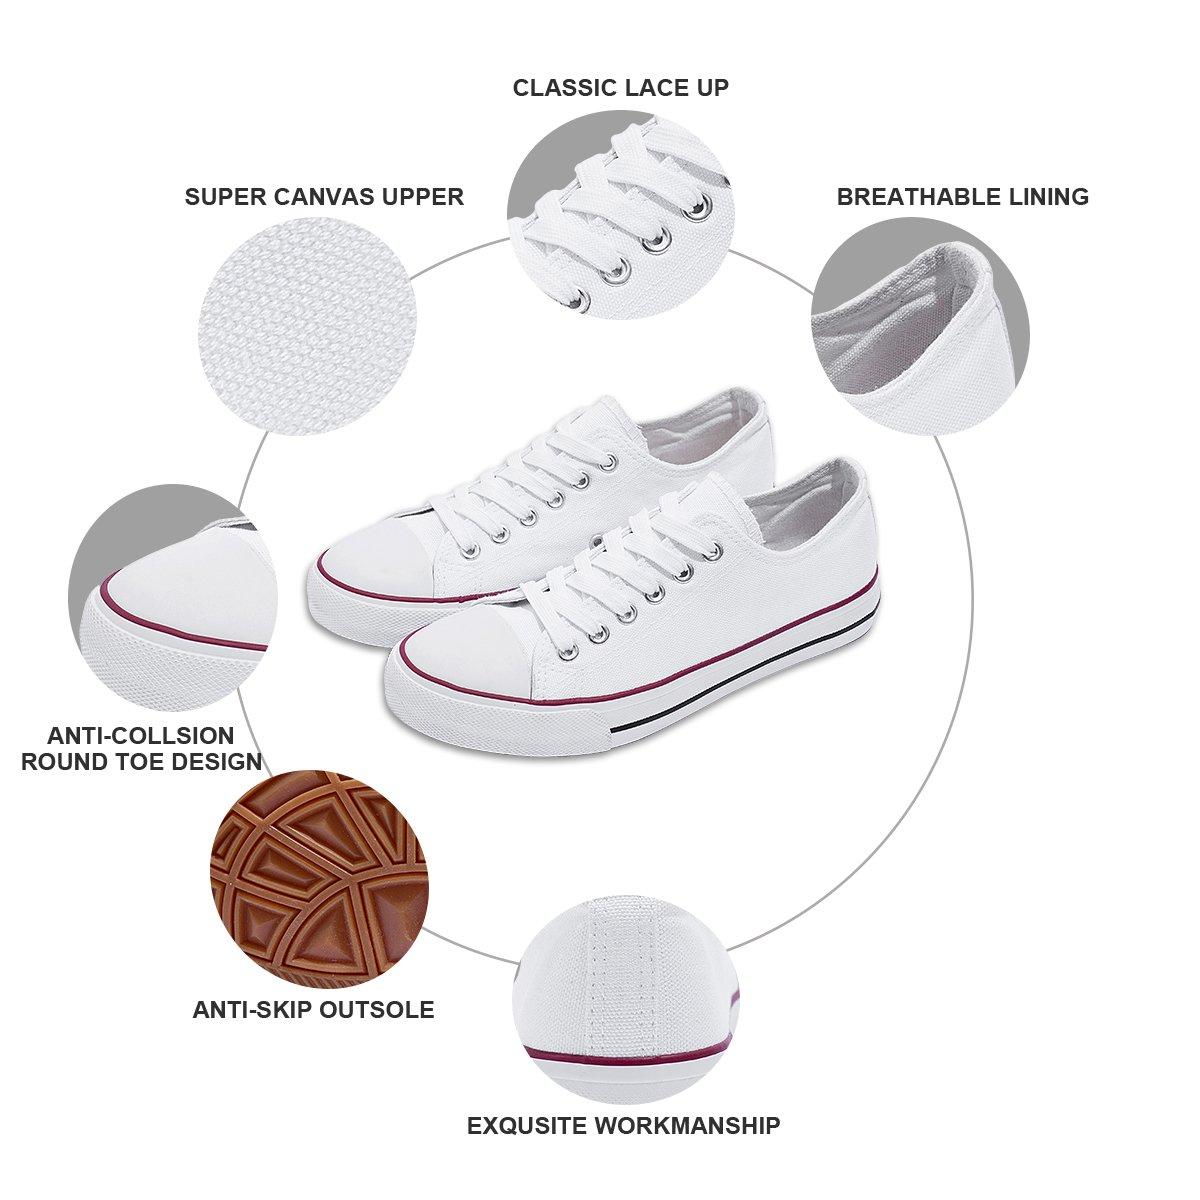 AOMAIS Womens Canvas Shoes Sneaker Low Top Lace up Fashion Walking Shoes (US7, white1) … by AOMAIS (Image #3)